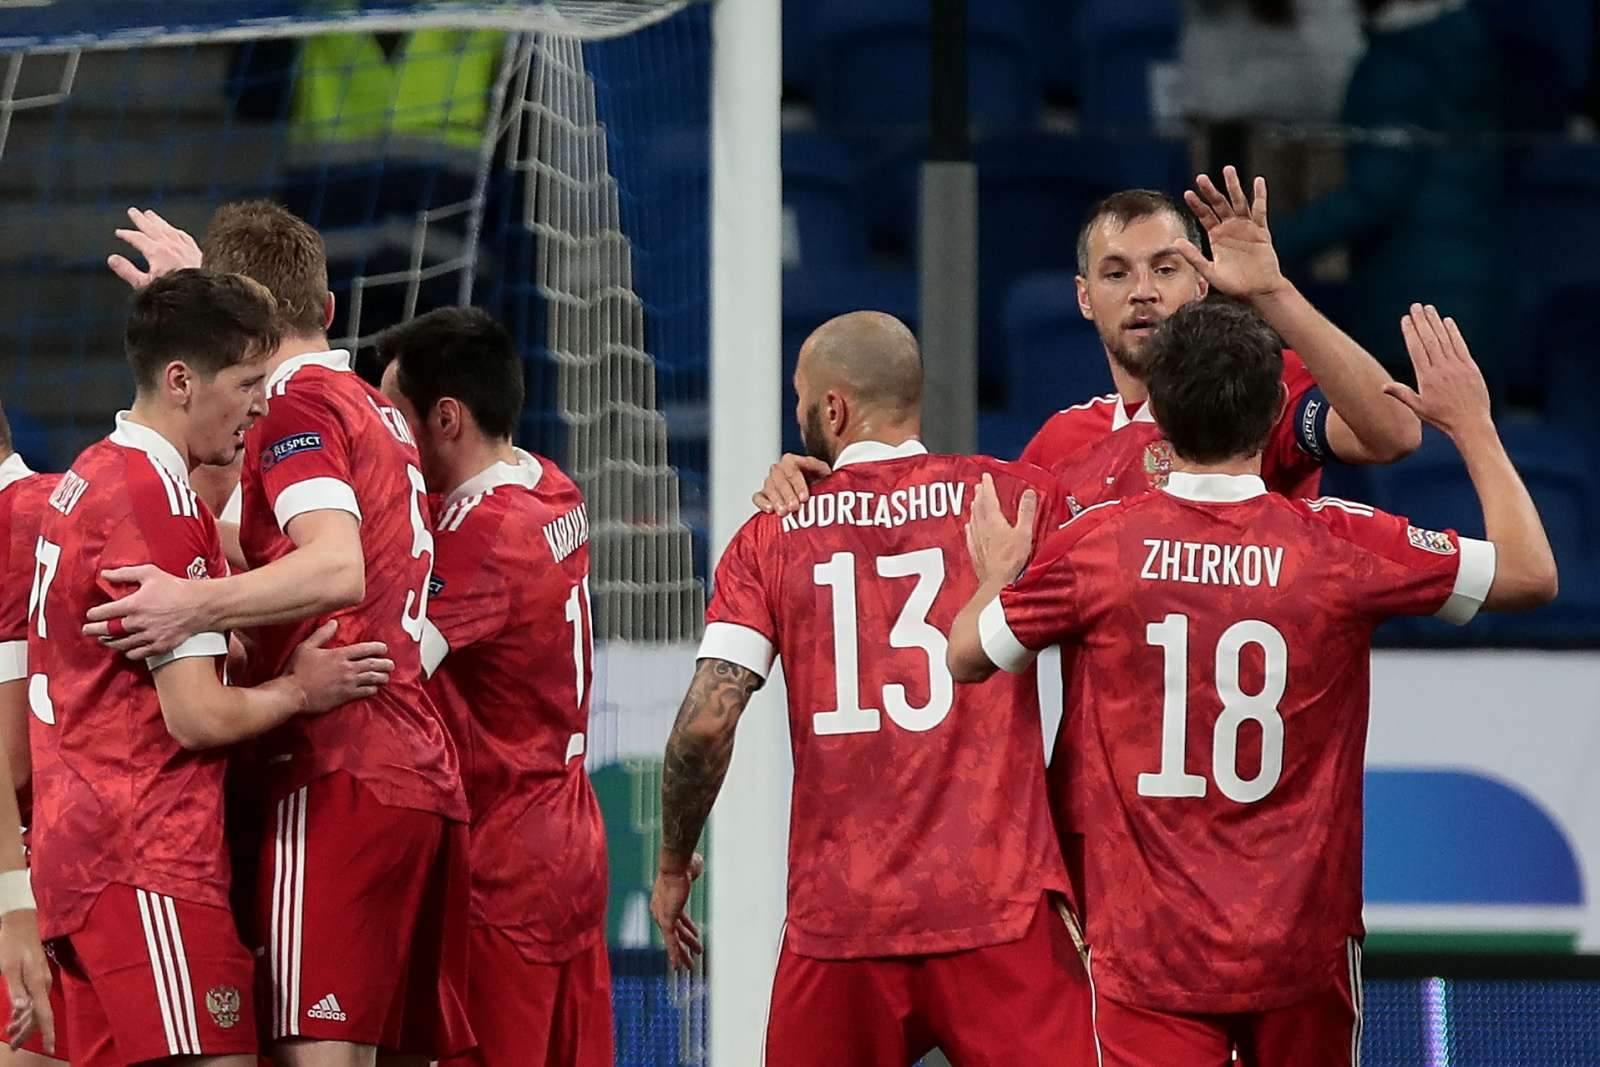 Россия – Болгария - 1:0 (завершён)